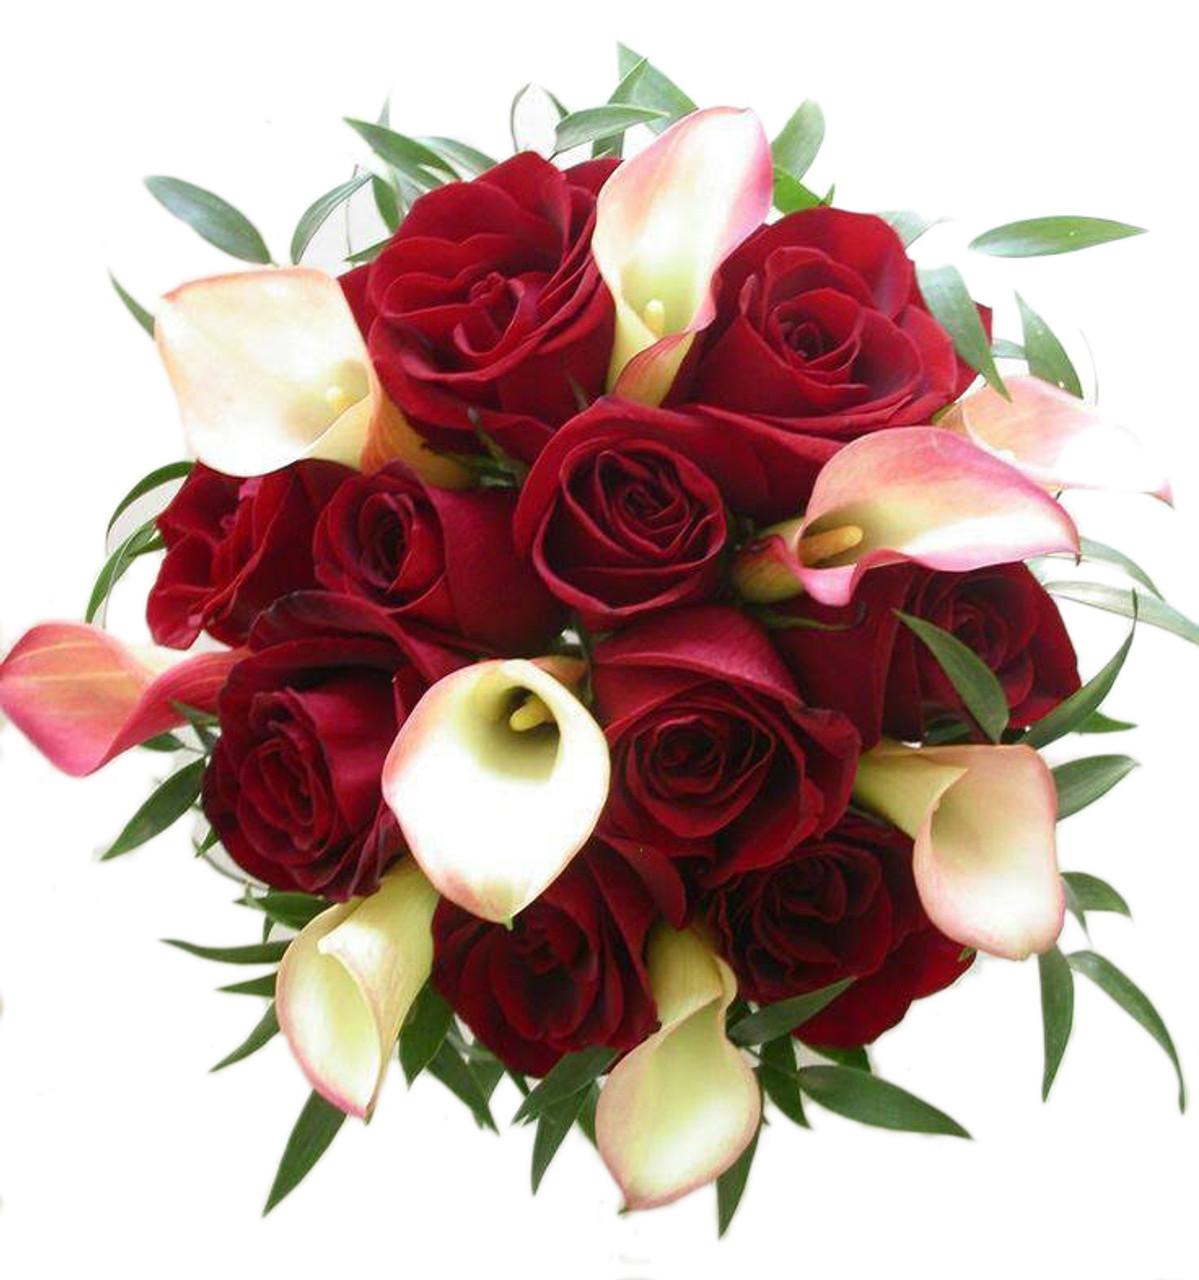 12 Roses & 12 Calla Lilies